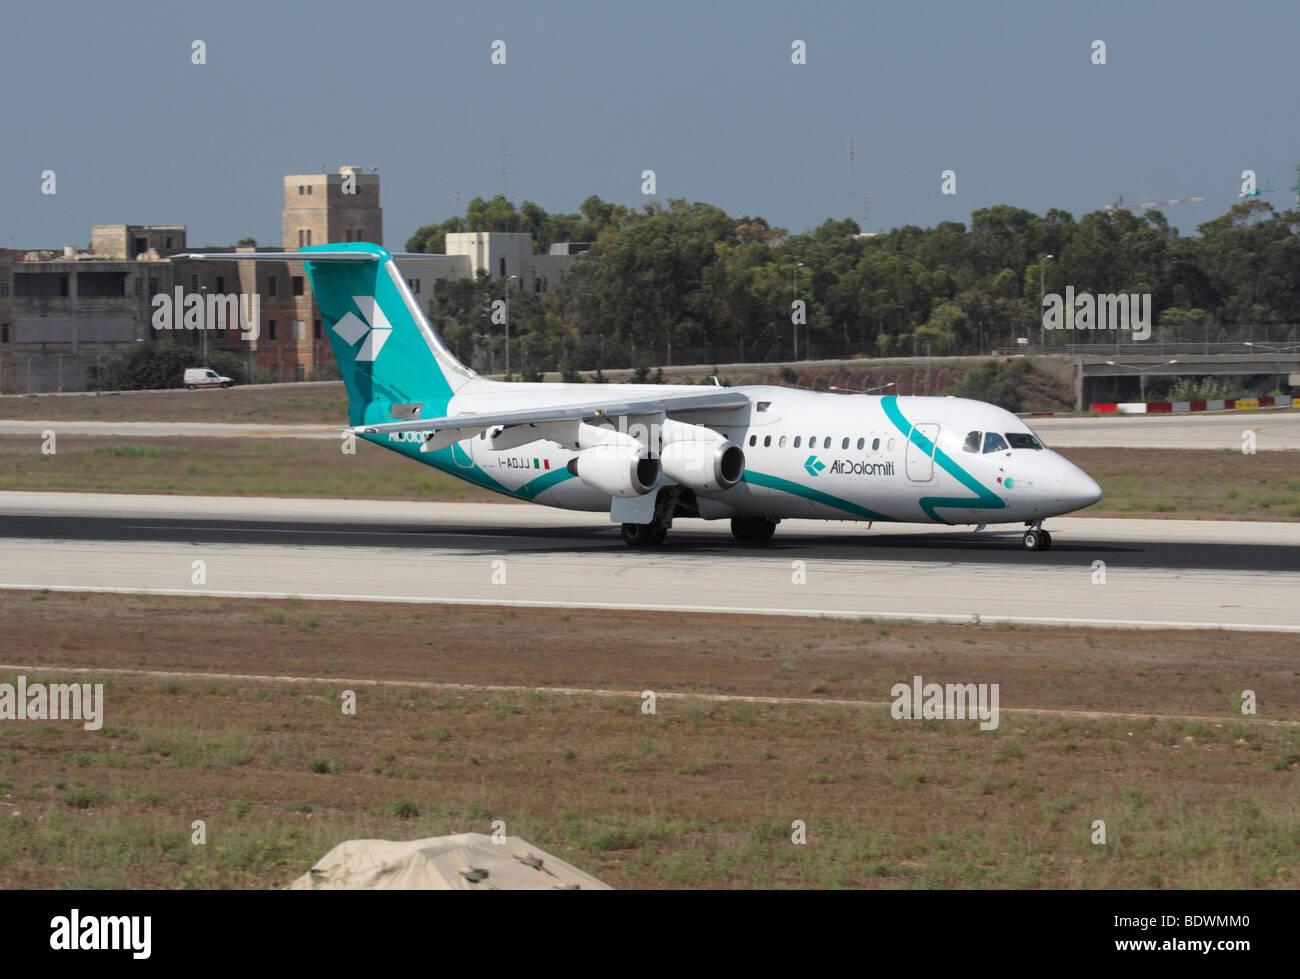 Air Dolomiti BAe 146 on departure - Stock Image